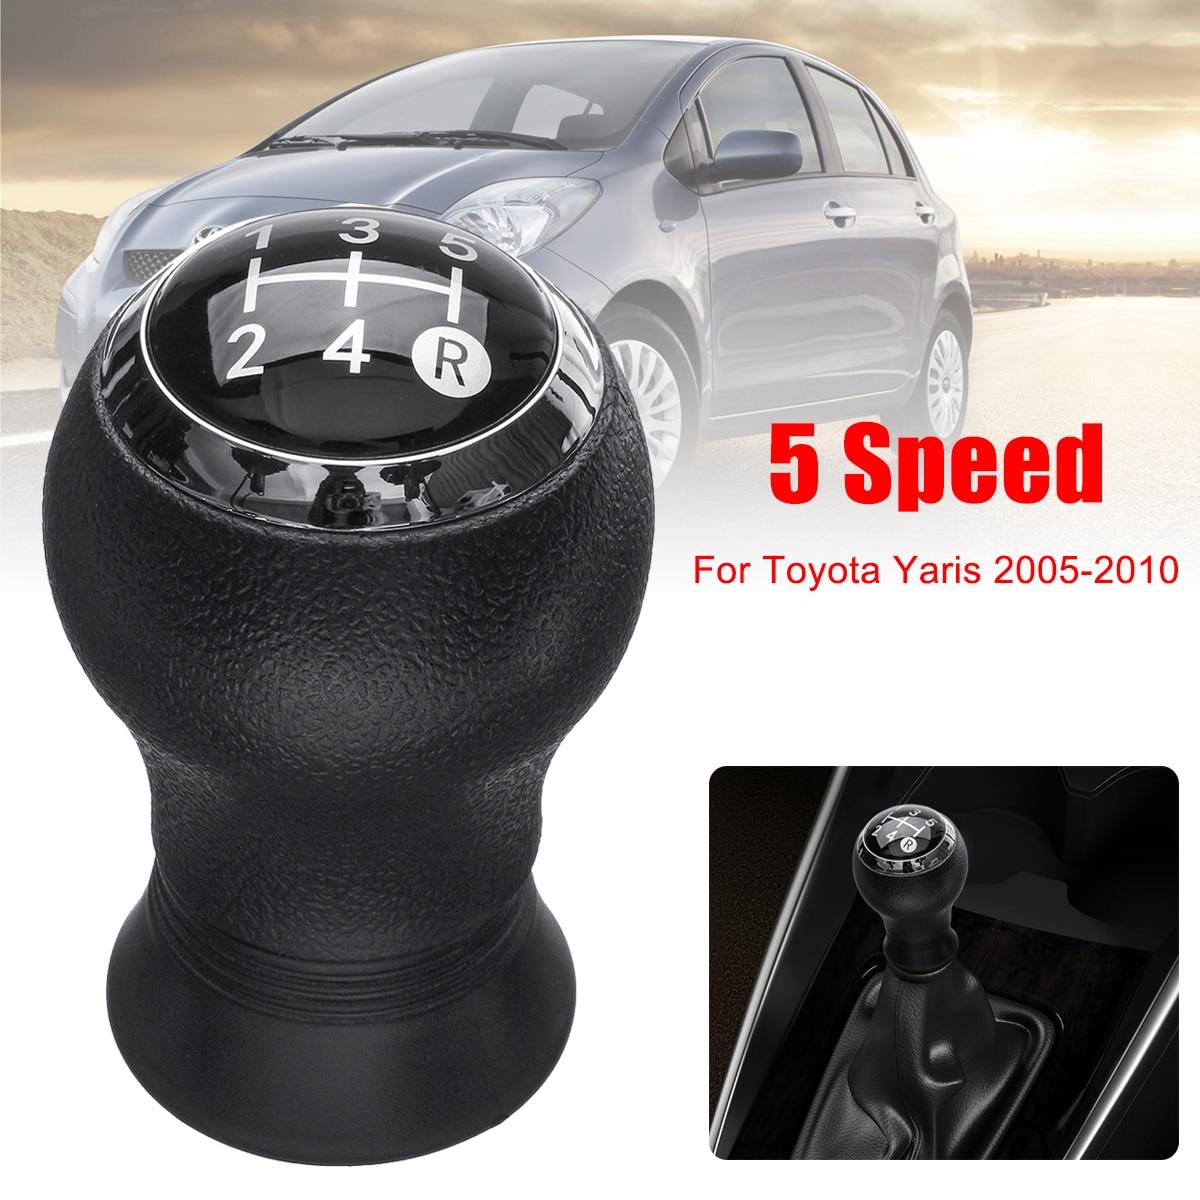 Para Toyota Yaris 2005-2010 5 velocidad MT Car Gear Shift Knob Head Gear Knob cubierta Shifter palanca